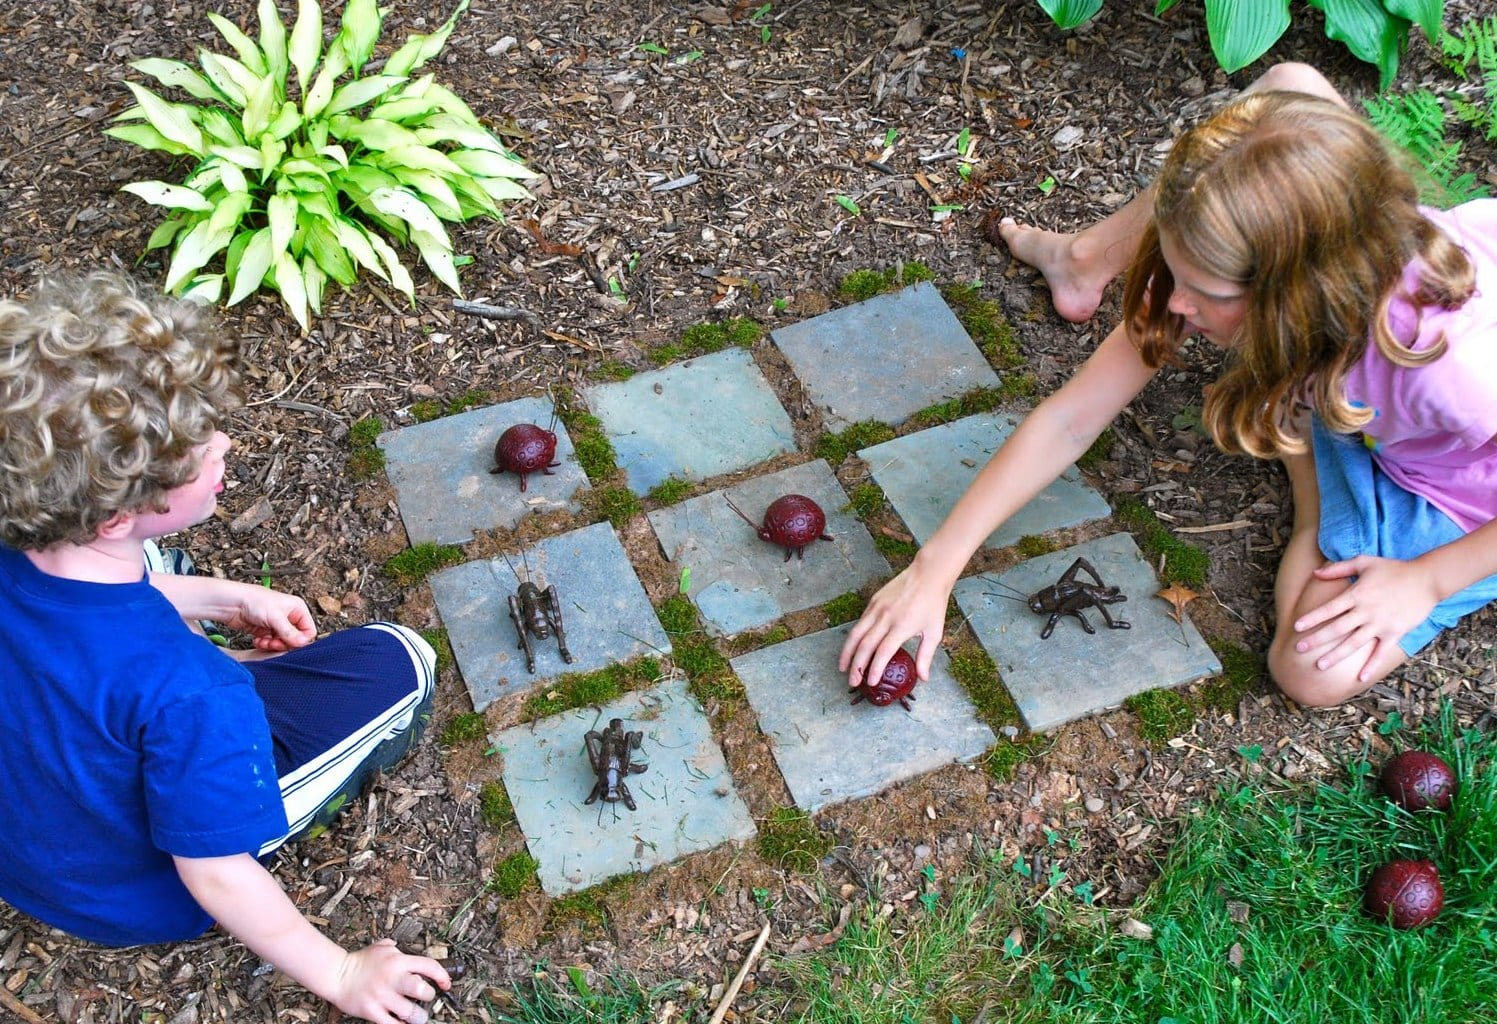 DIY Kinderspielplatz aus naturmaterialien